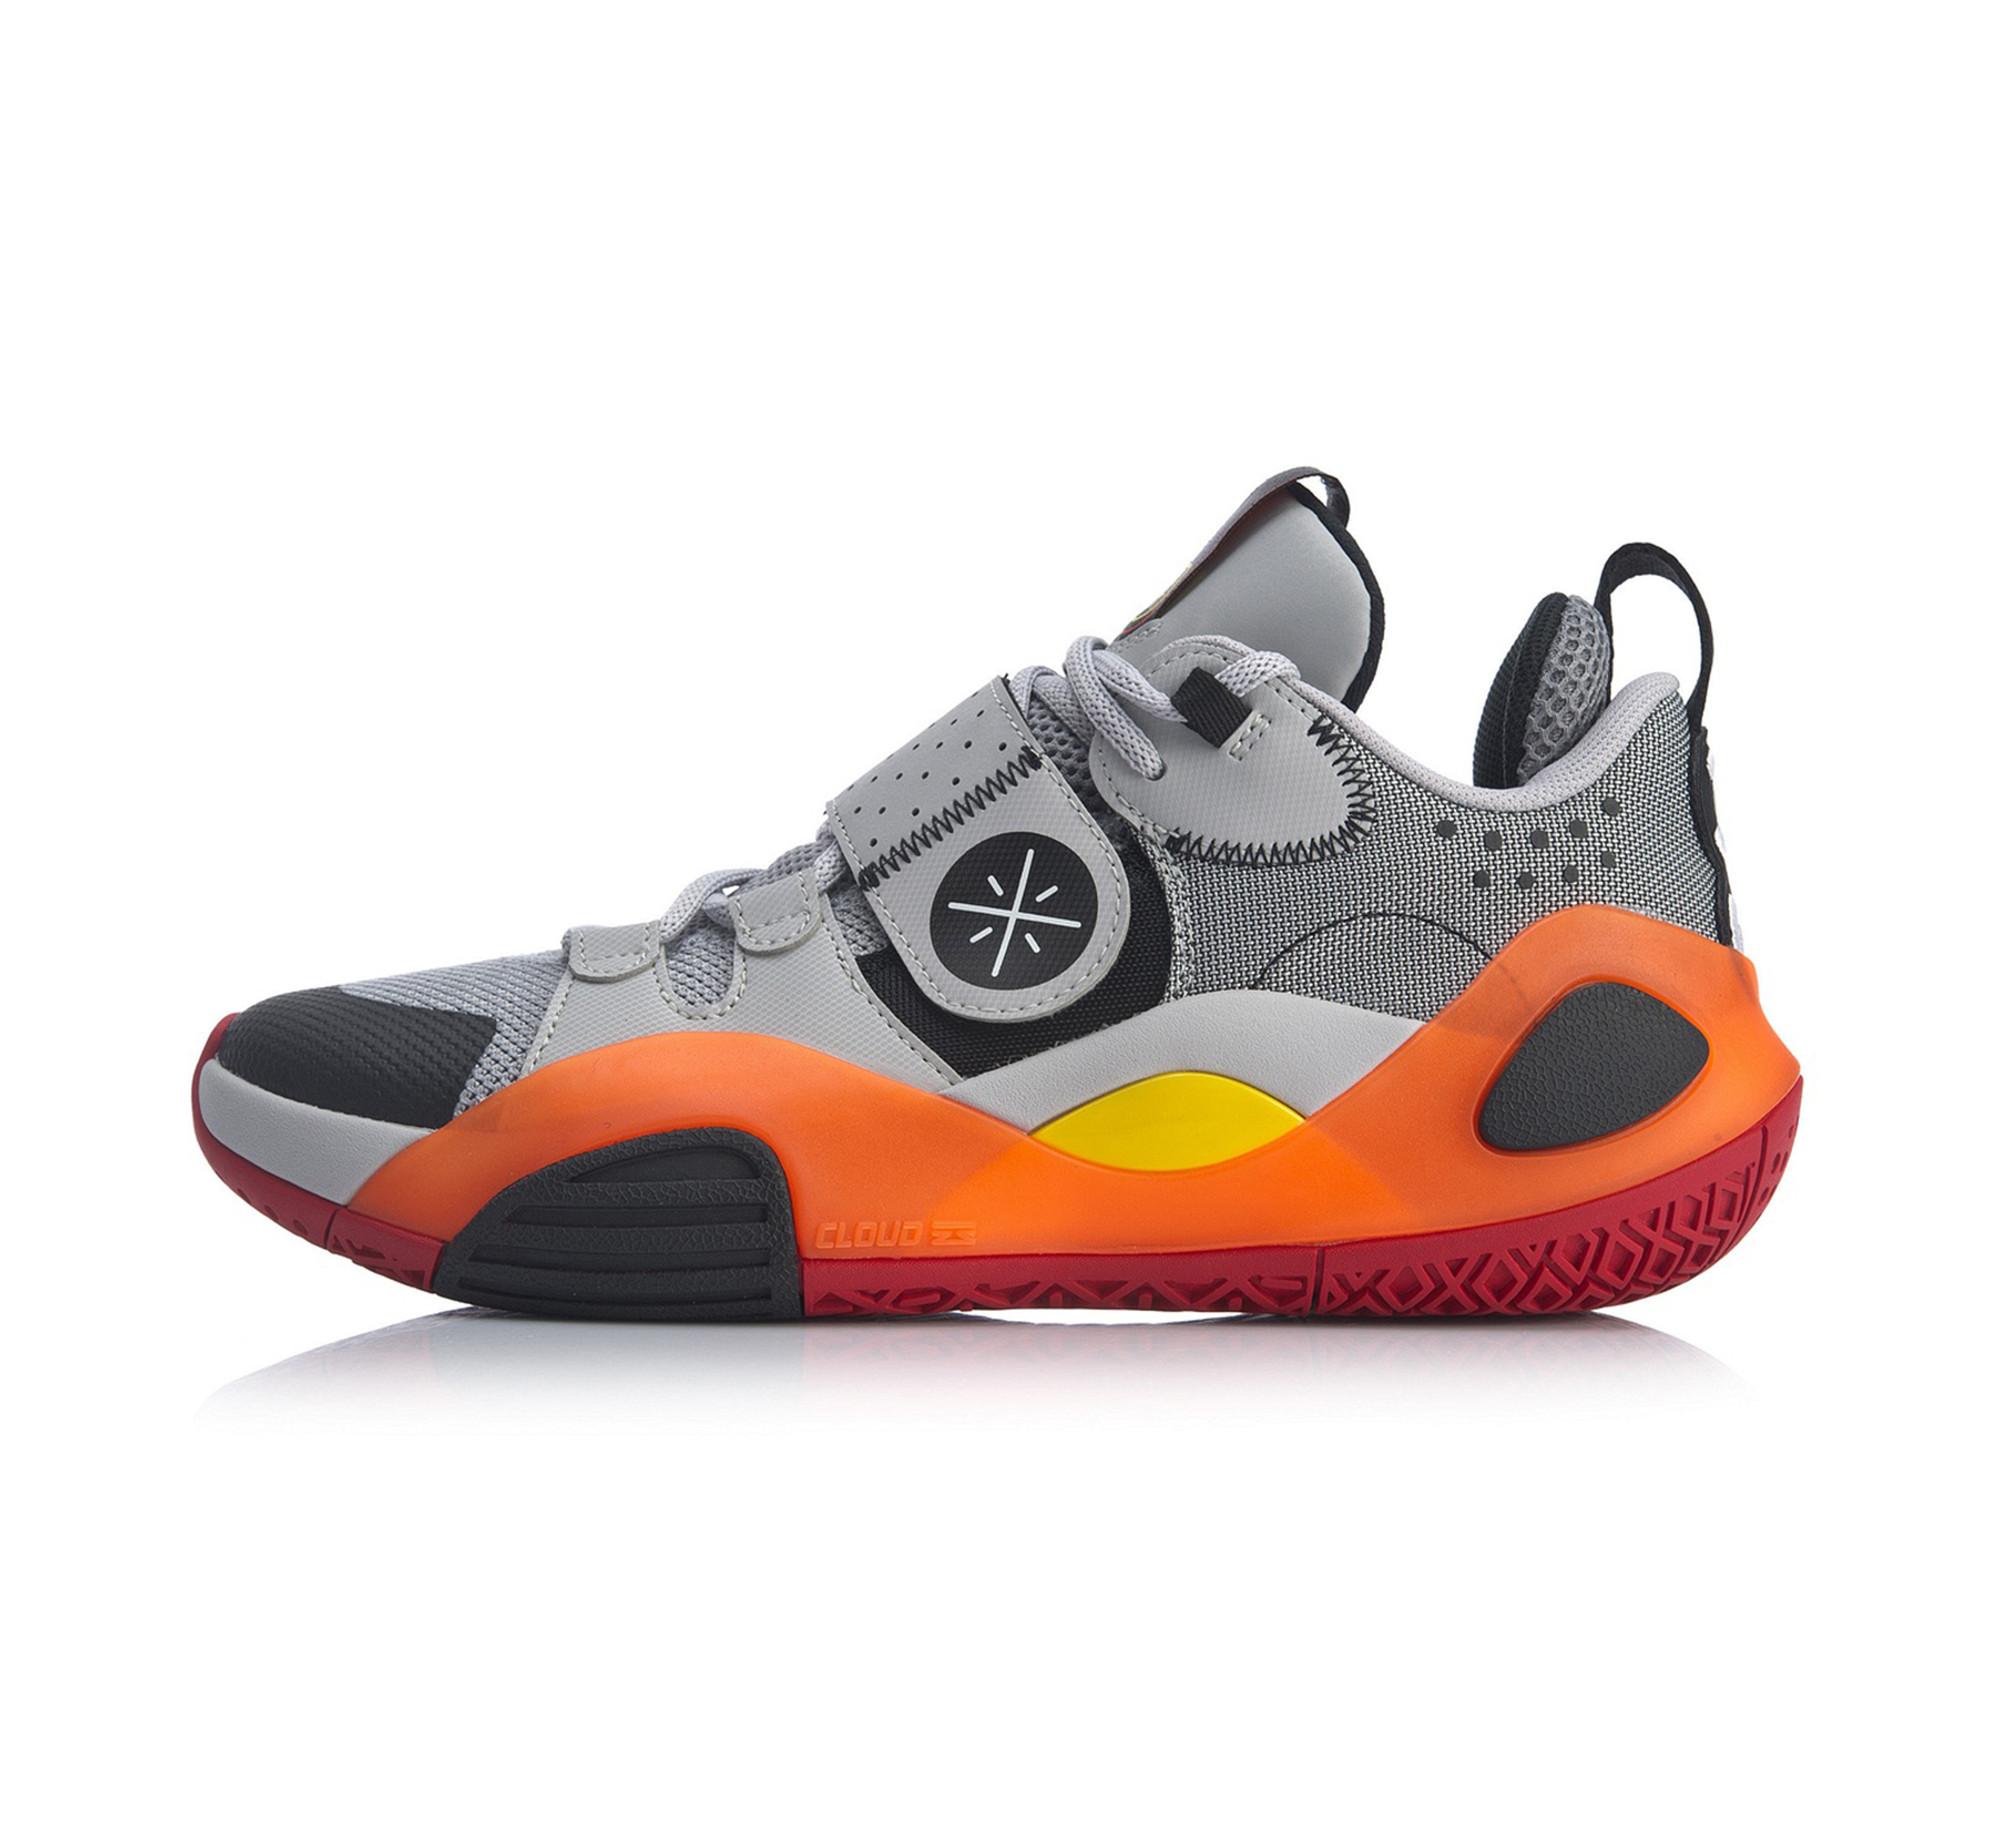 Li-Ning Wade All City 8 Basketball Shoe